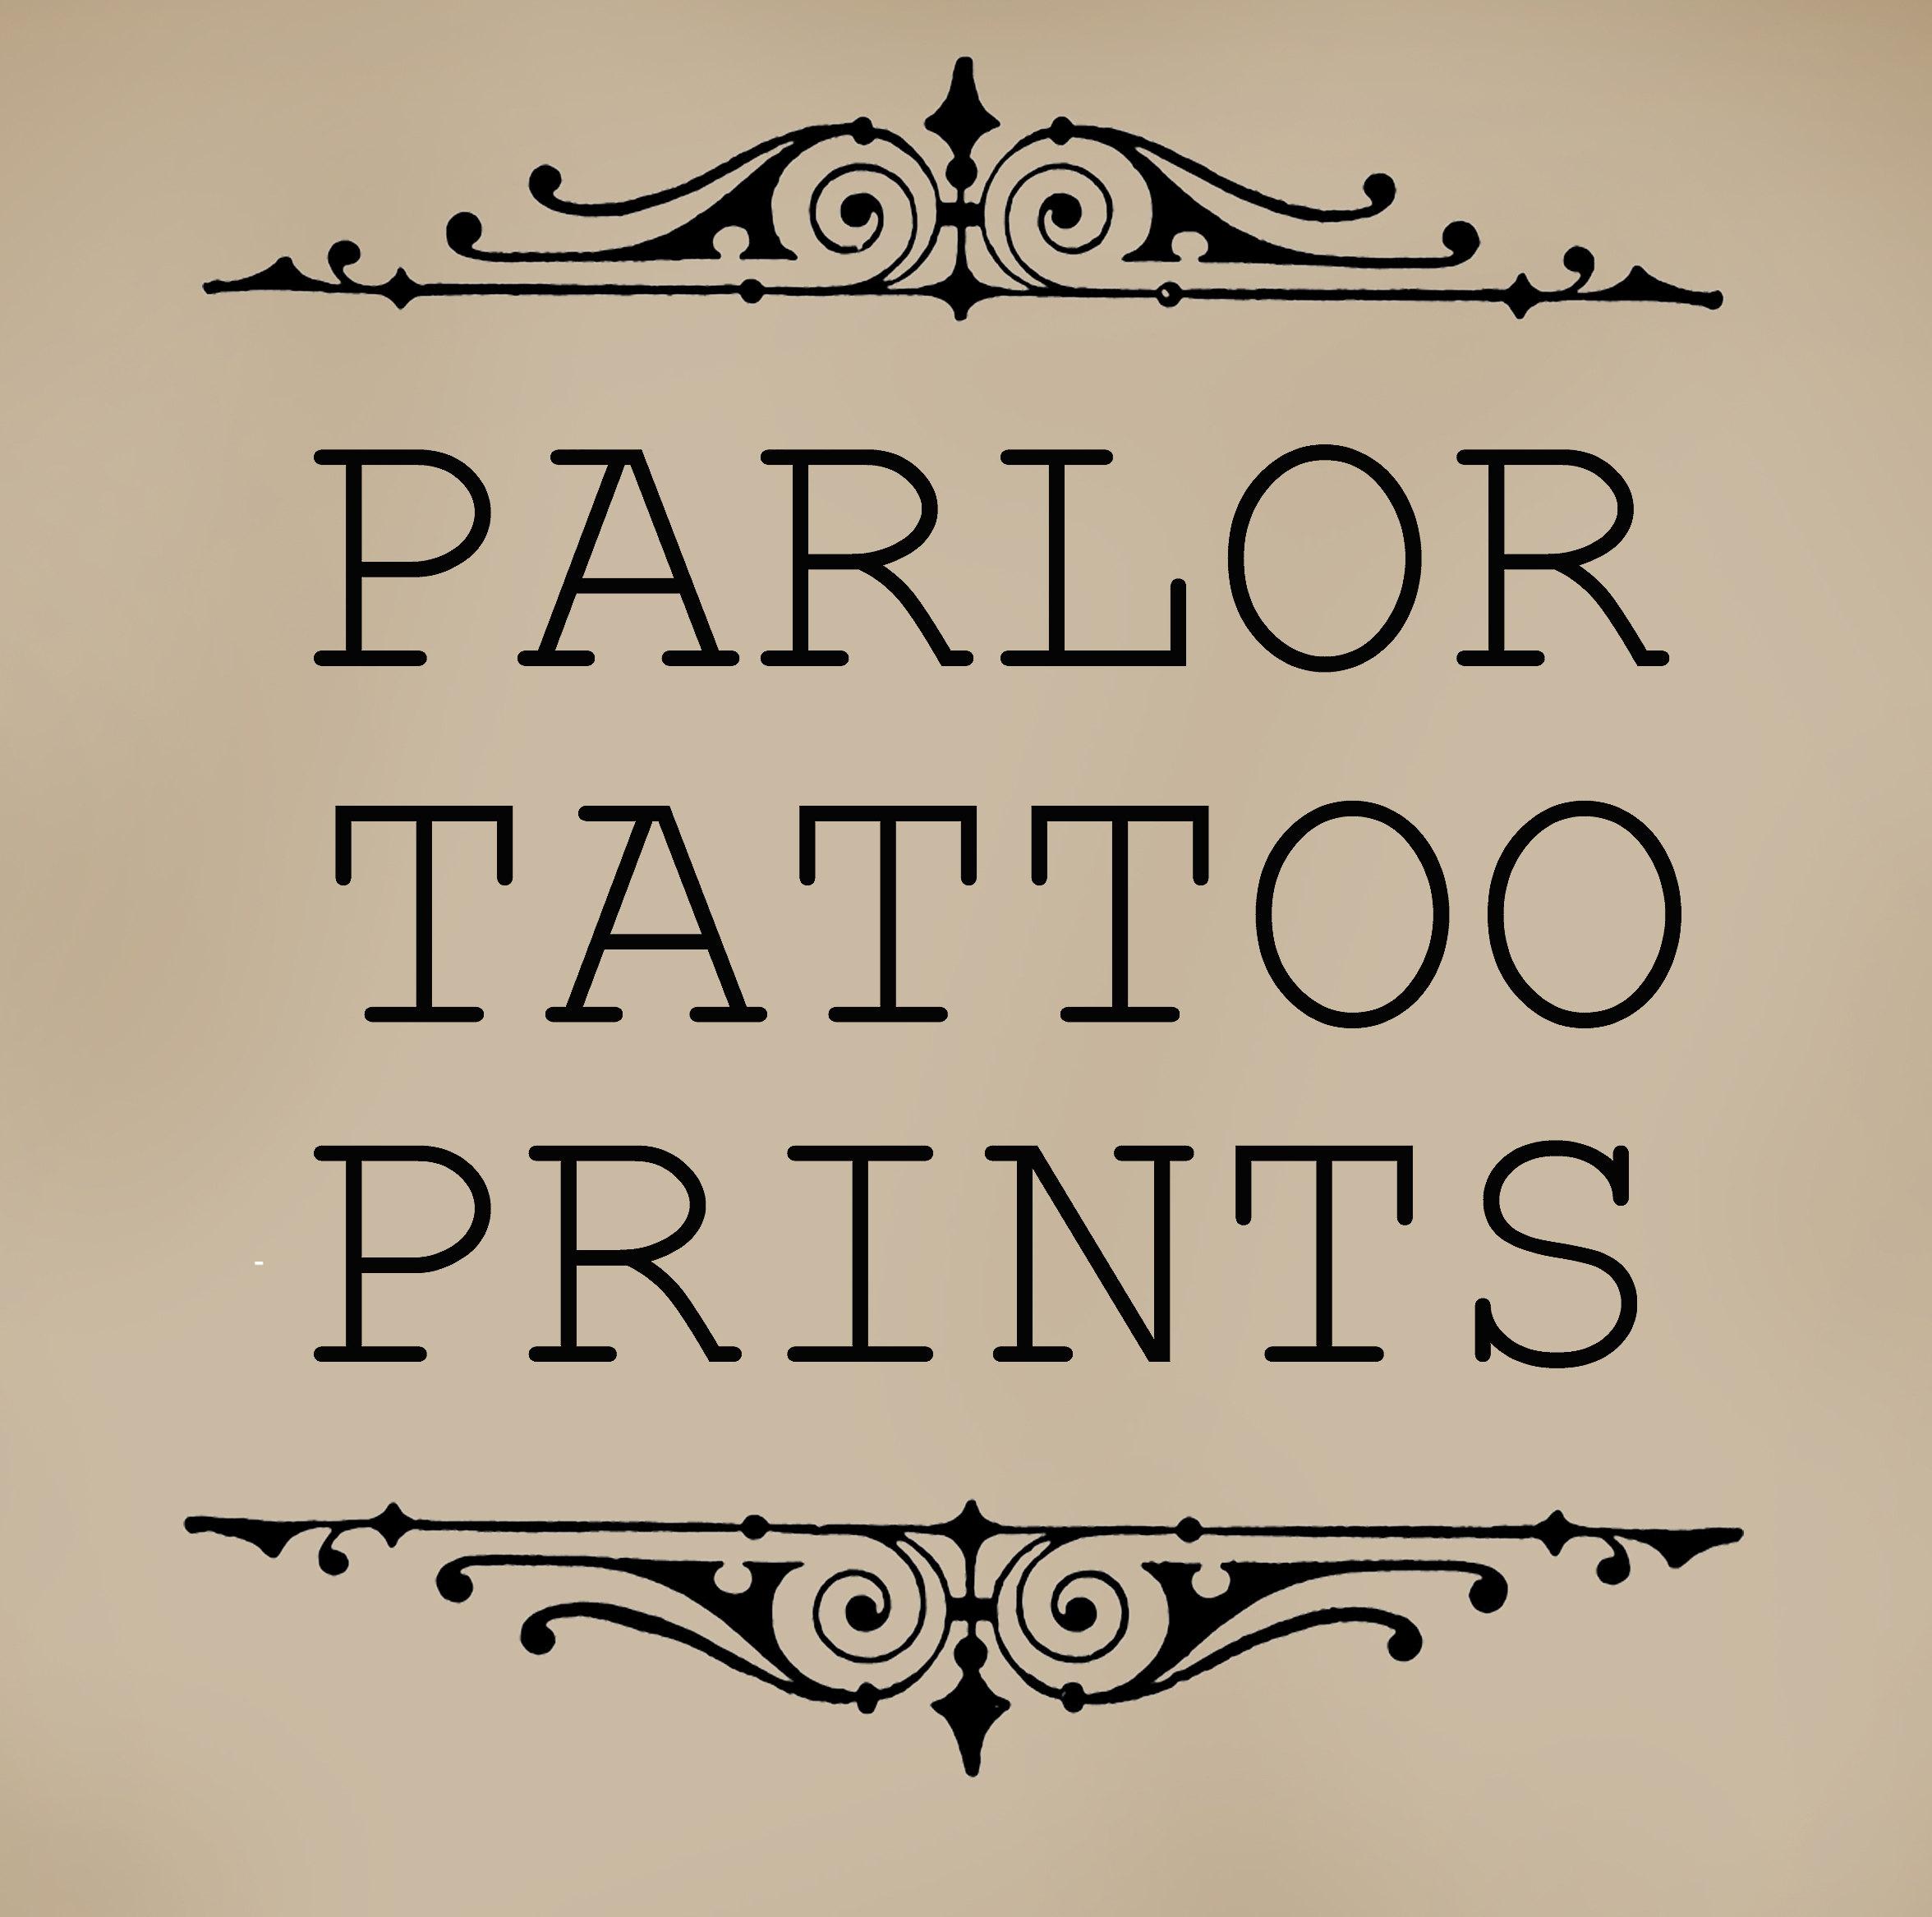 Traditional Tattoo Flash Art by Quyen Dinh por ParlorTattooPrints